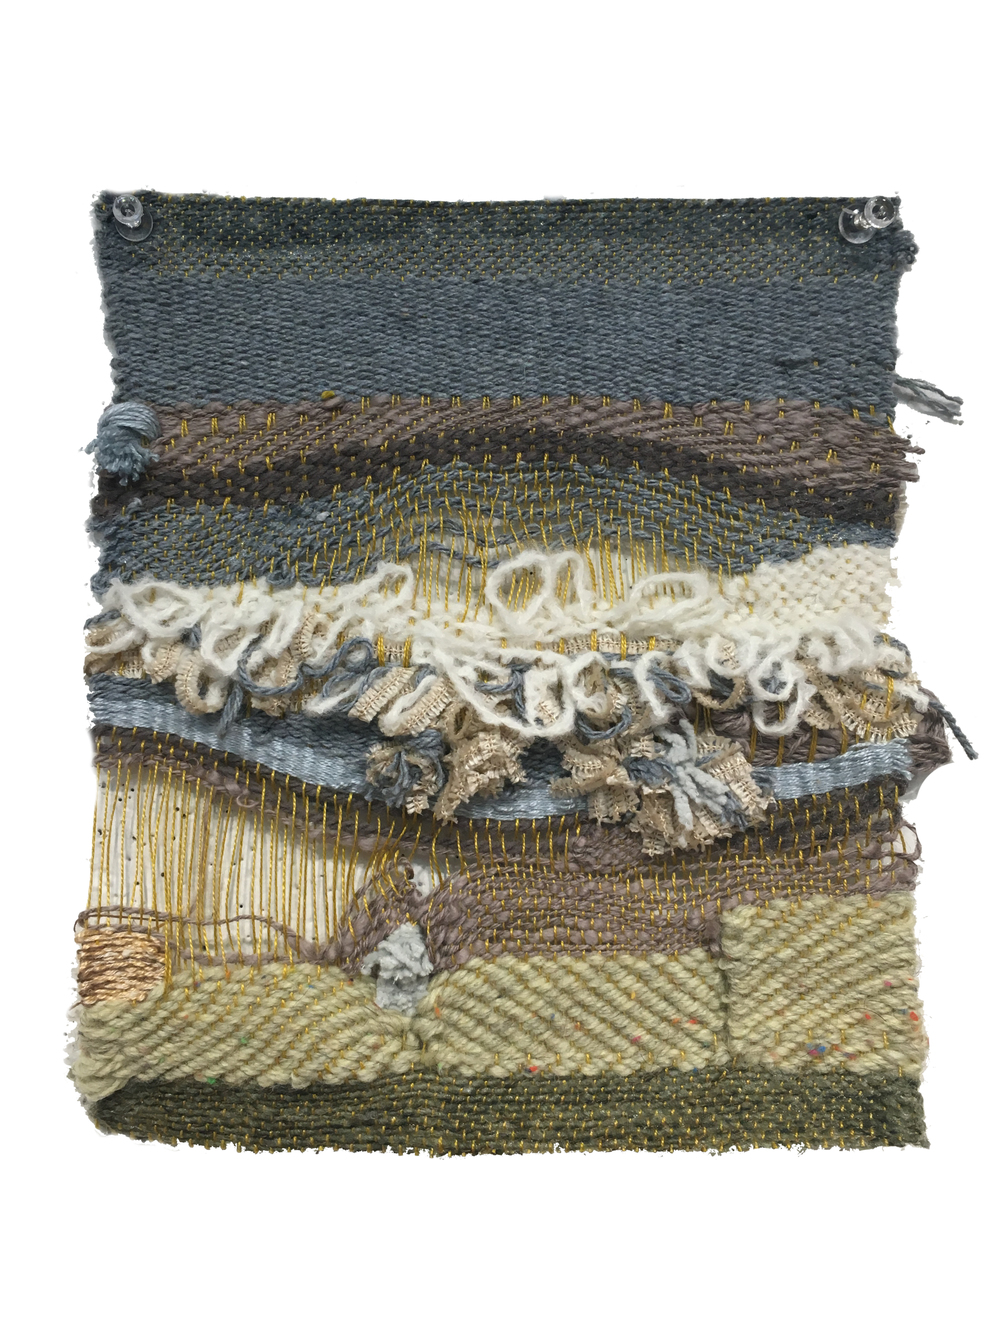 weaving1sample6.jpg